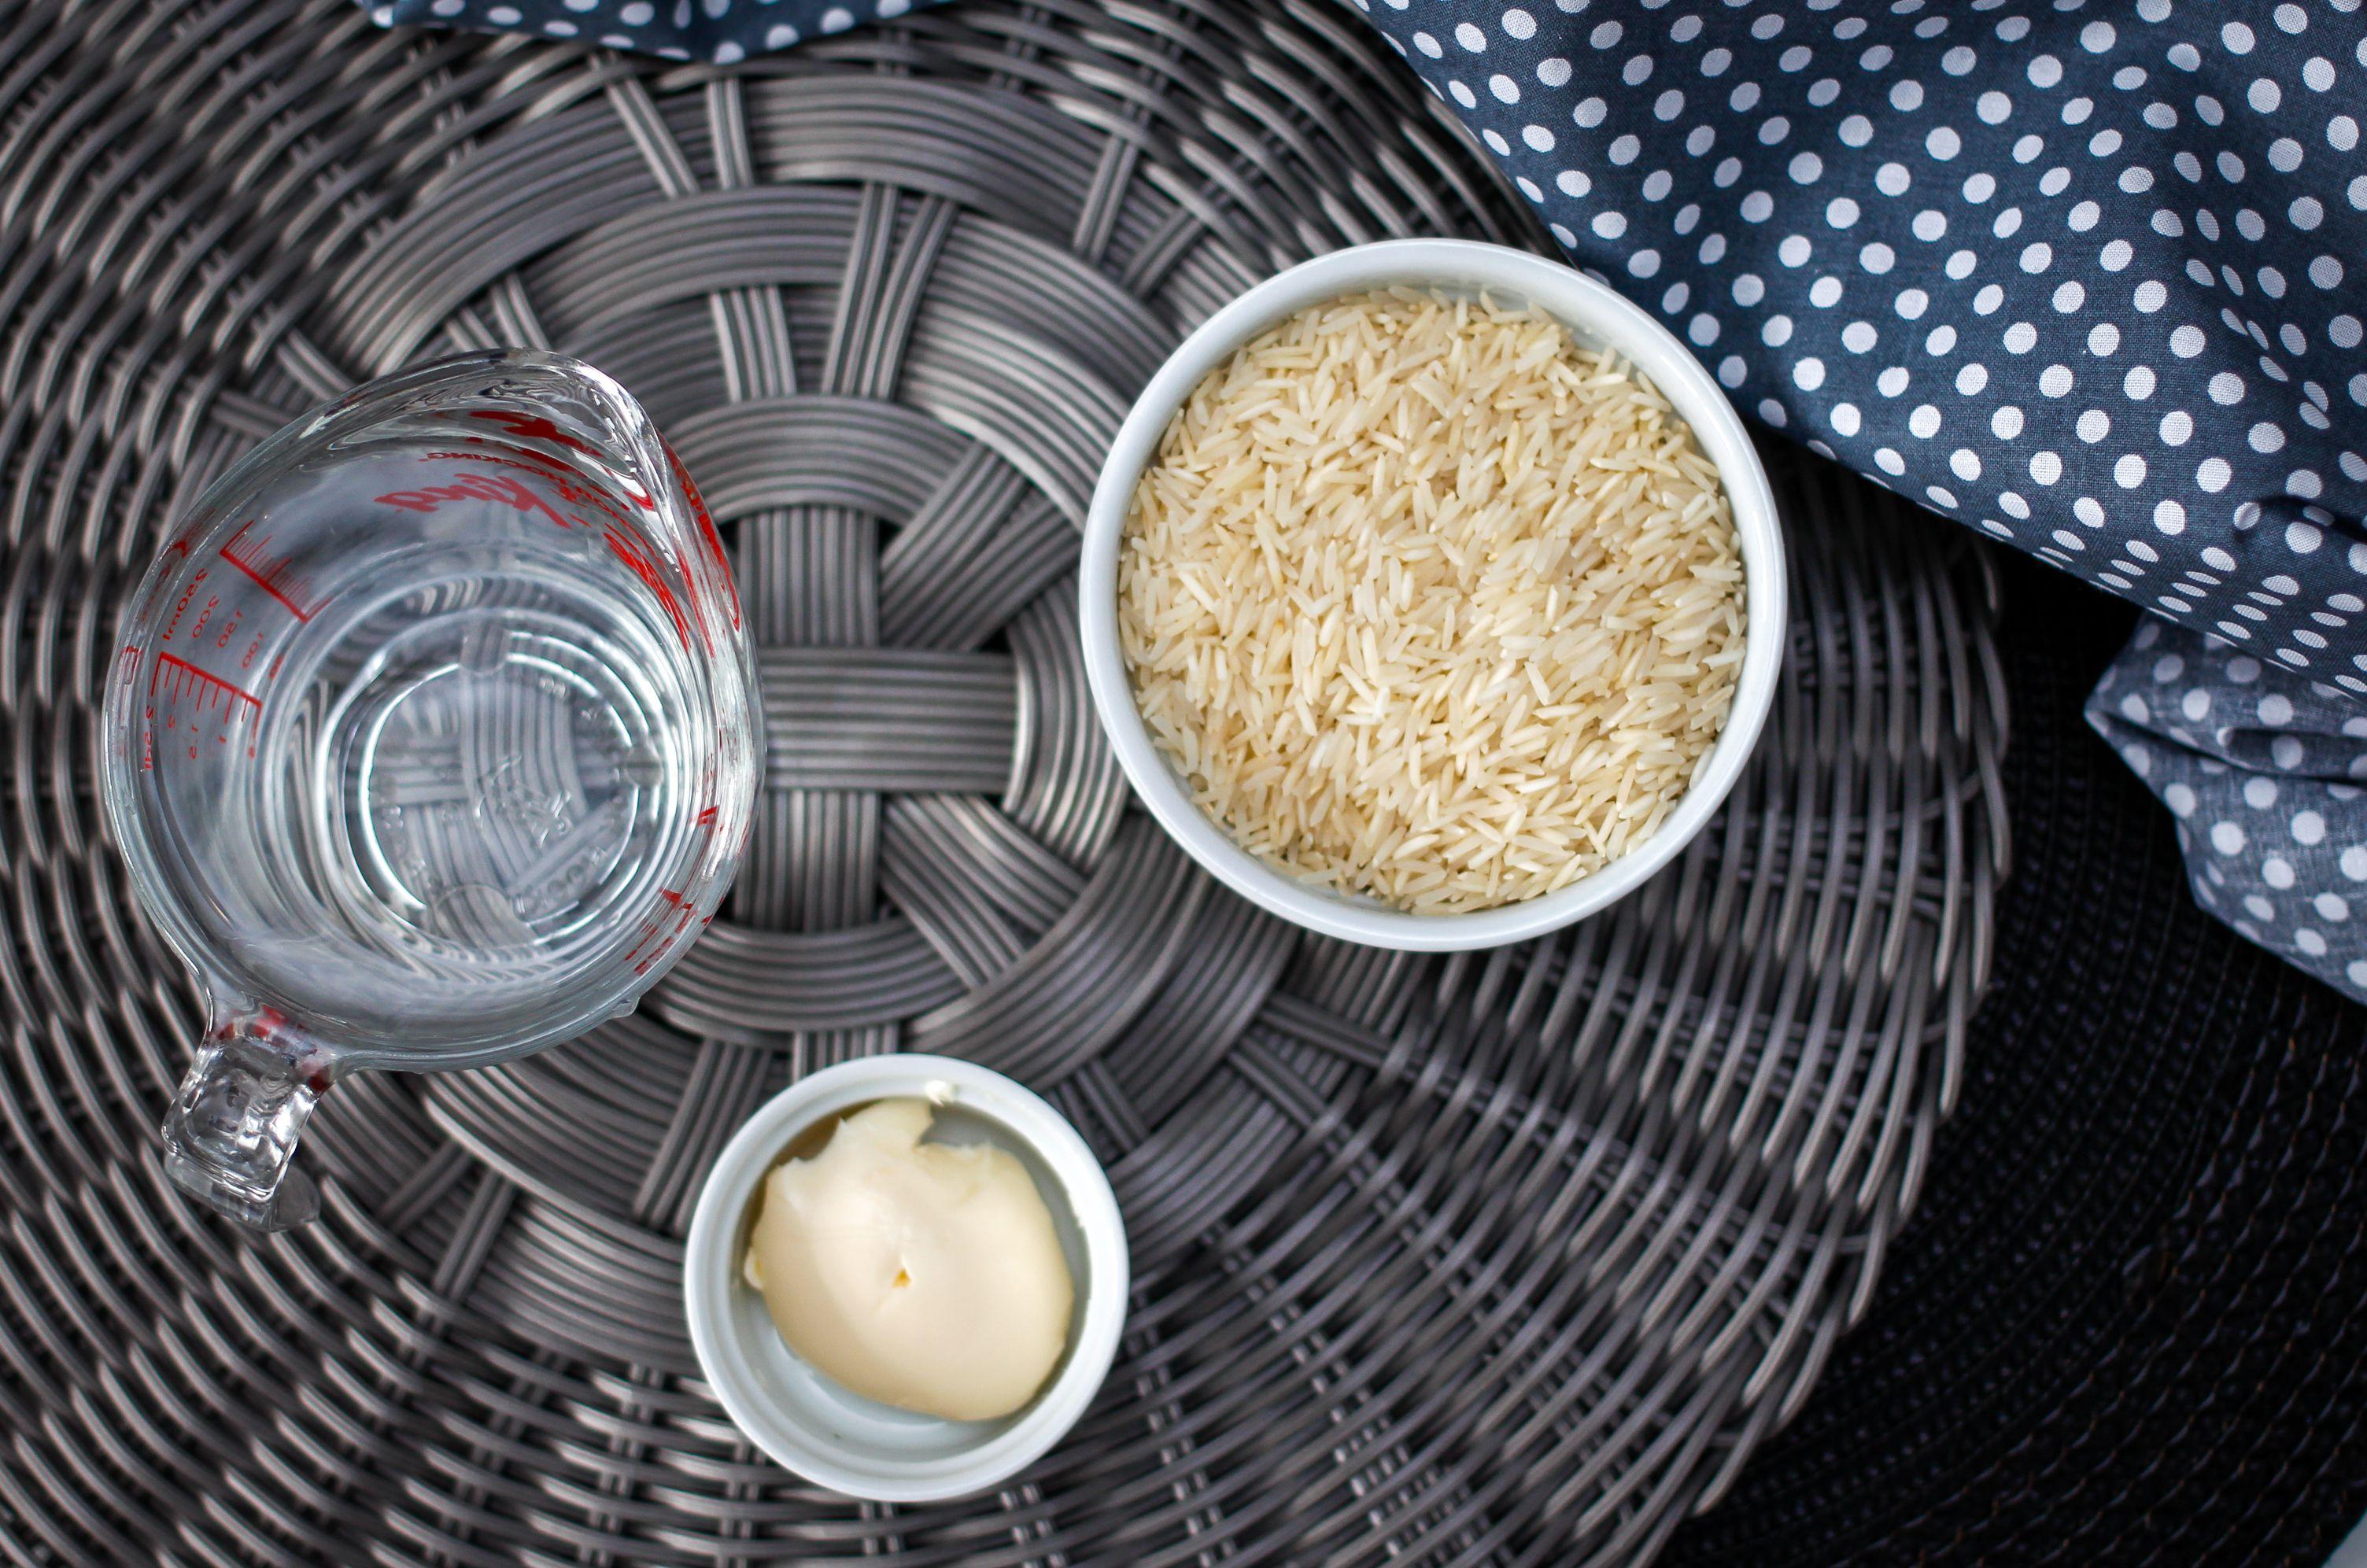 Ingredients for crock pot rice